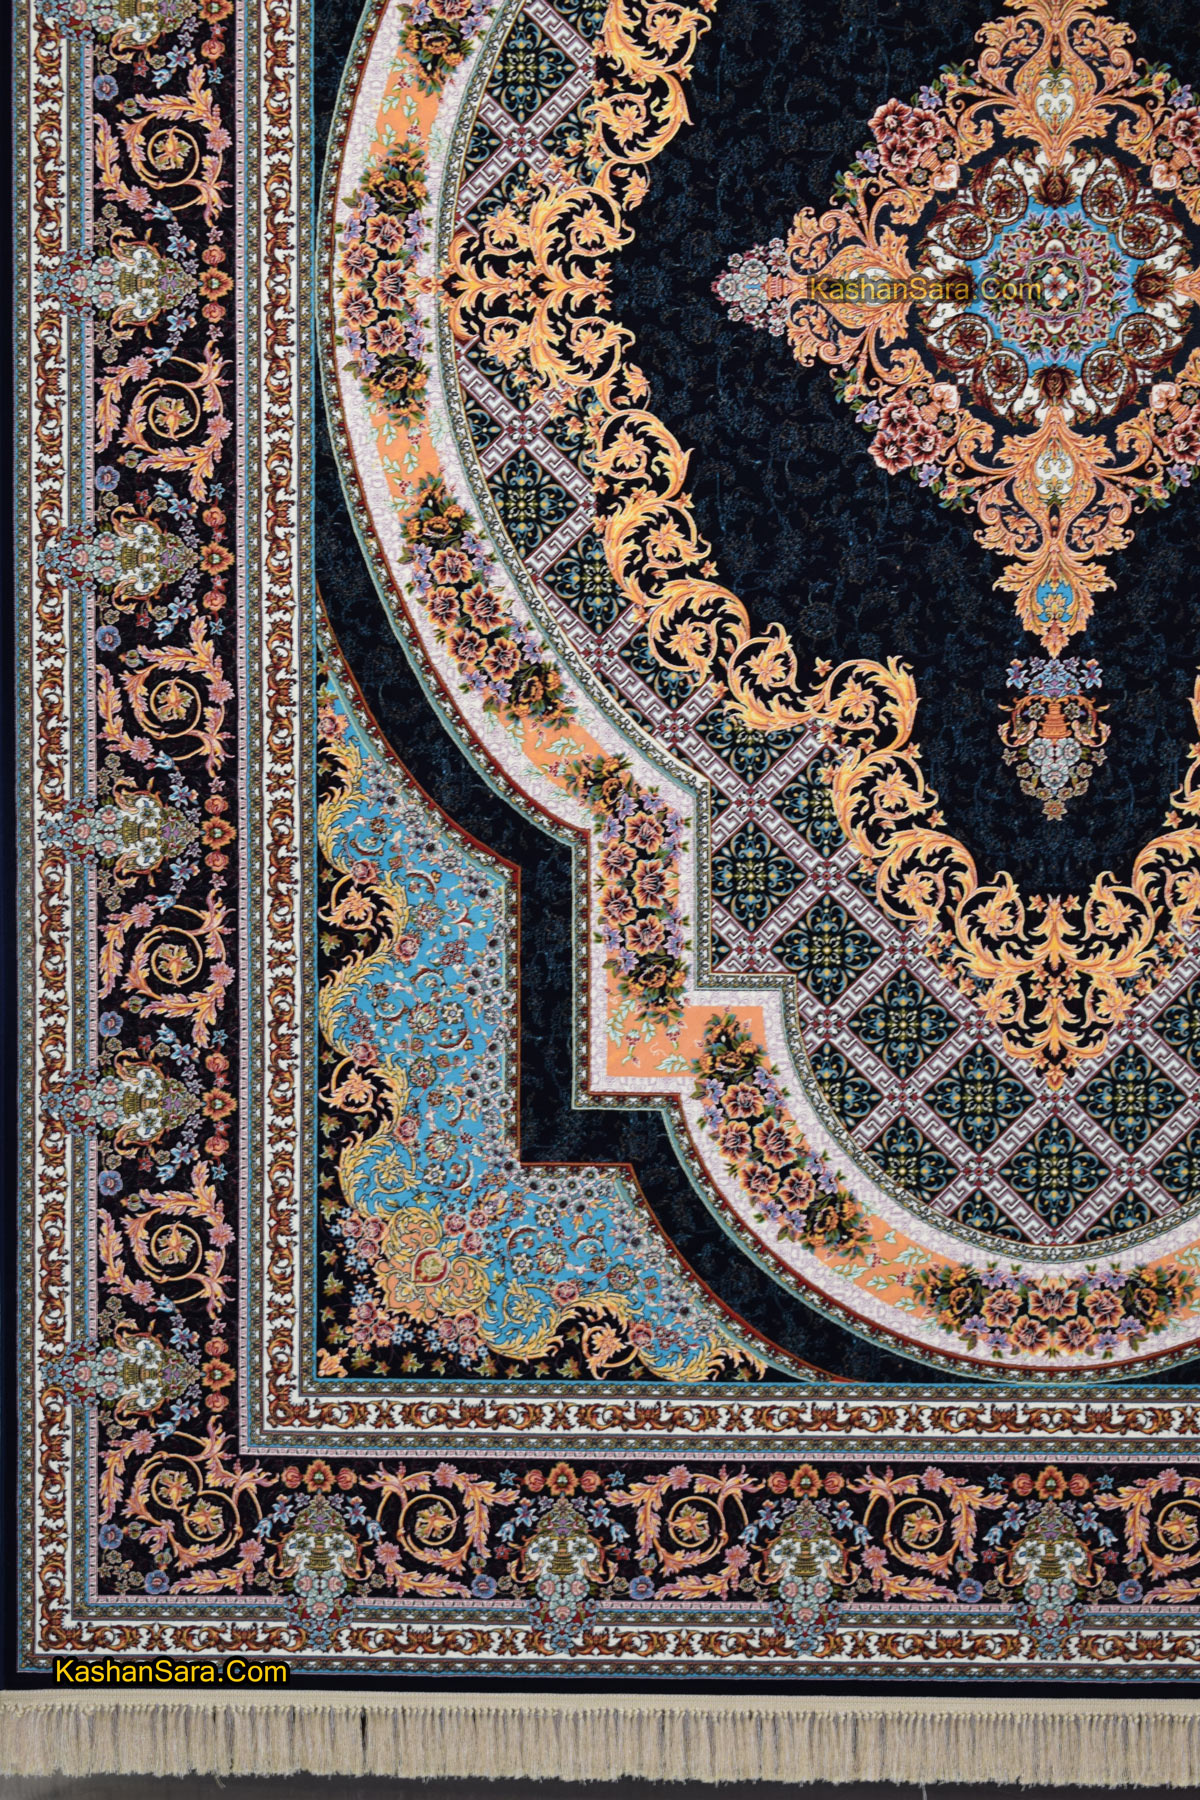 قیمت فرش کاشان طرح زرنگار ۱۲۰۰ شانه